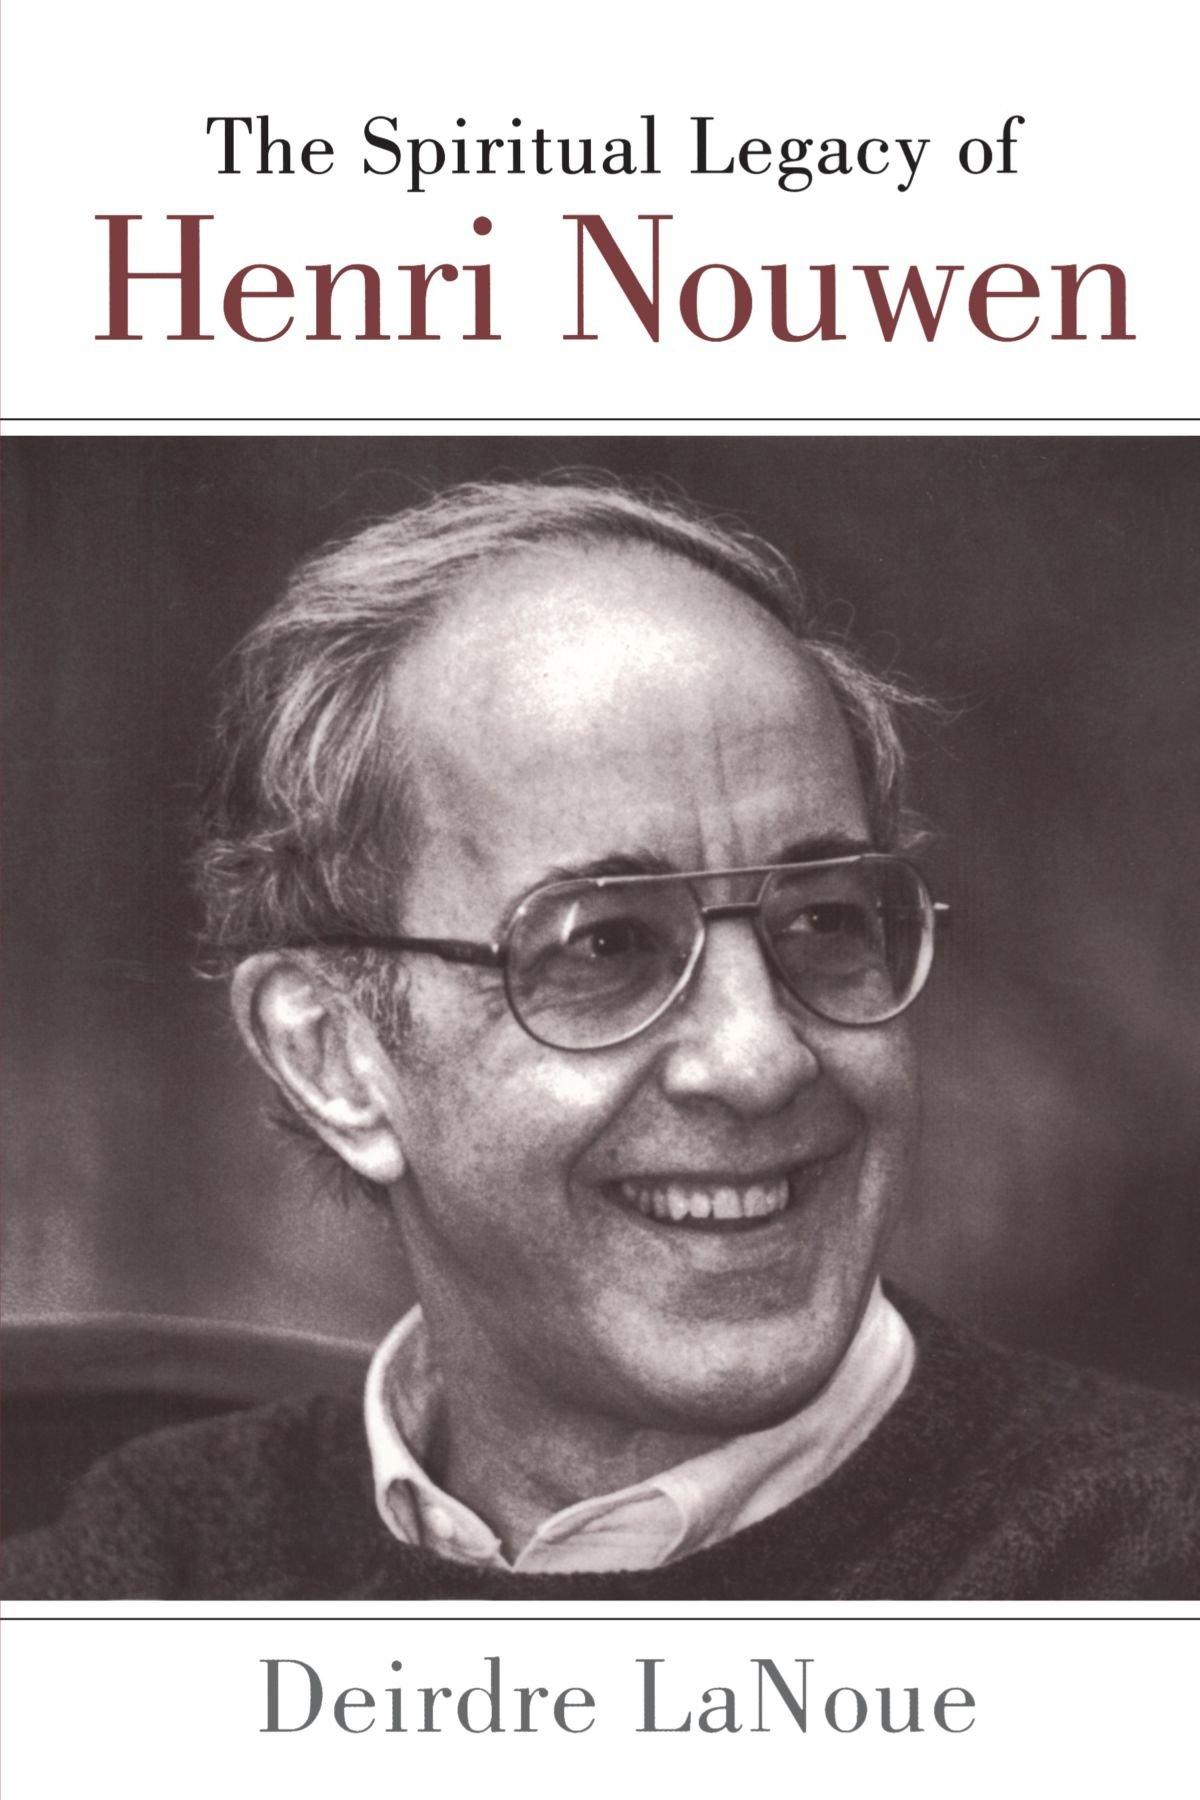 The Spiritual Legacy of Henri Nouwen PDF